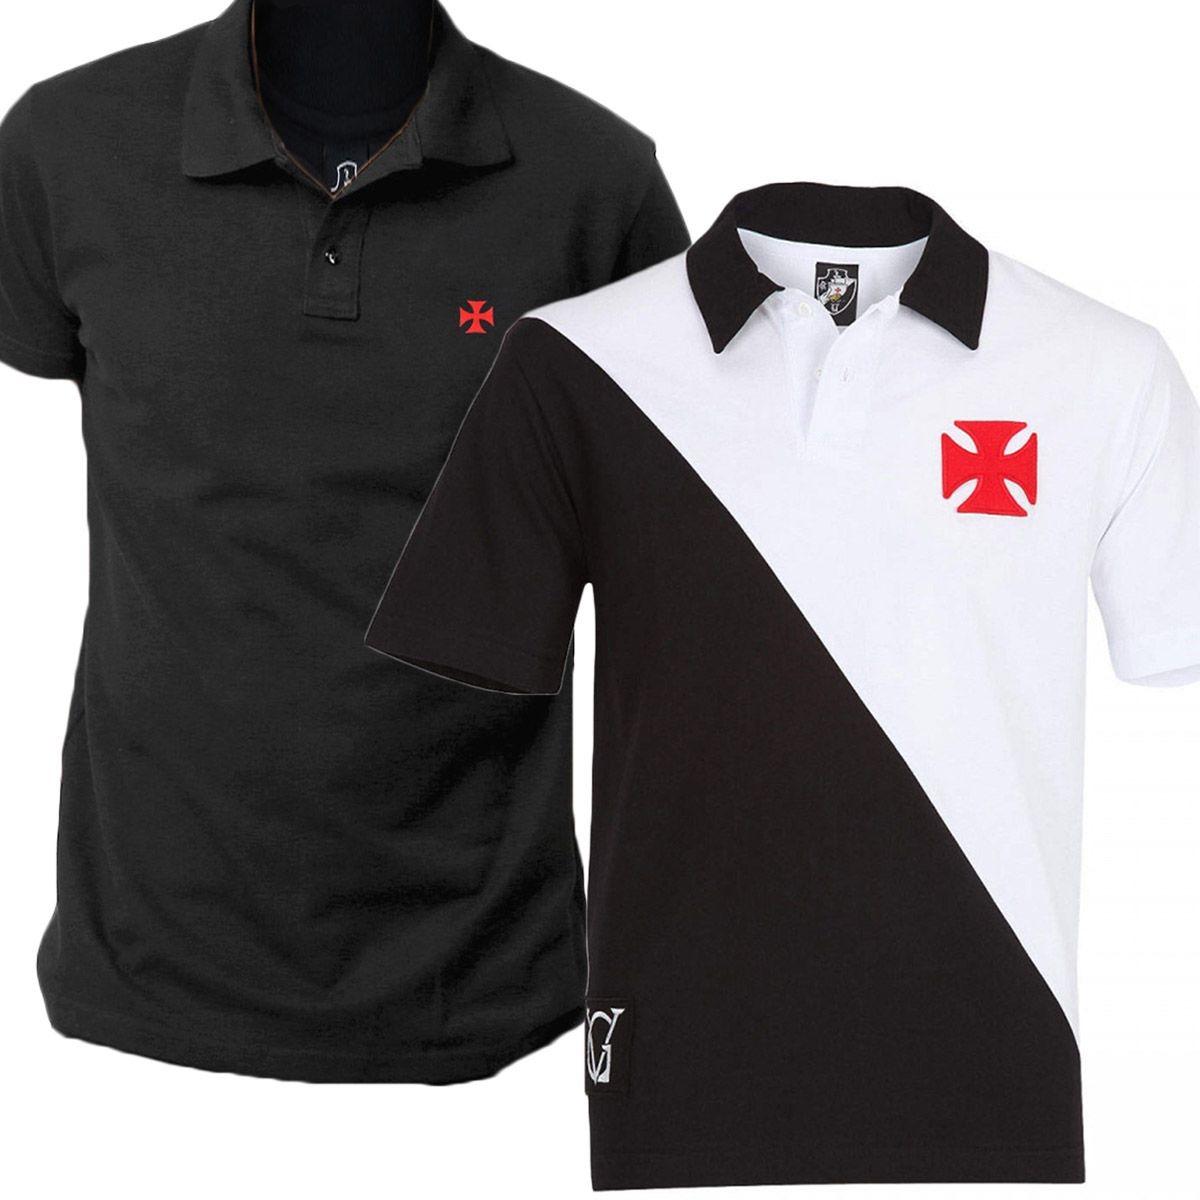 49bdef2441b1c Kit C  2 Camisas Polo Vasco Da Gama Piquet Oficial C nf - R  85